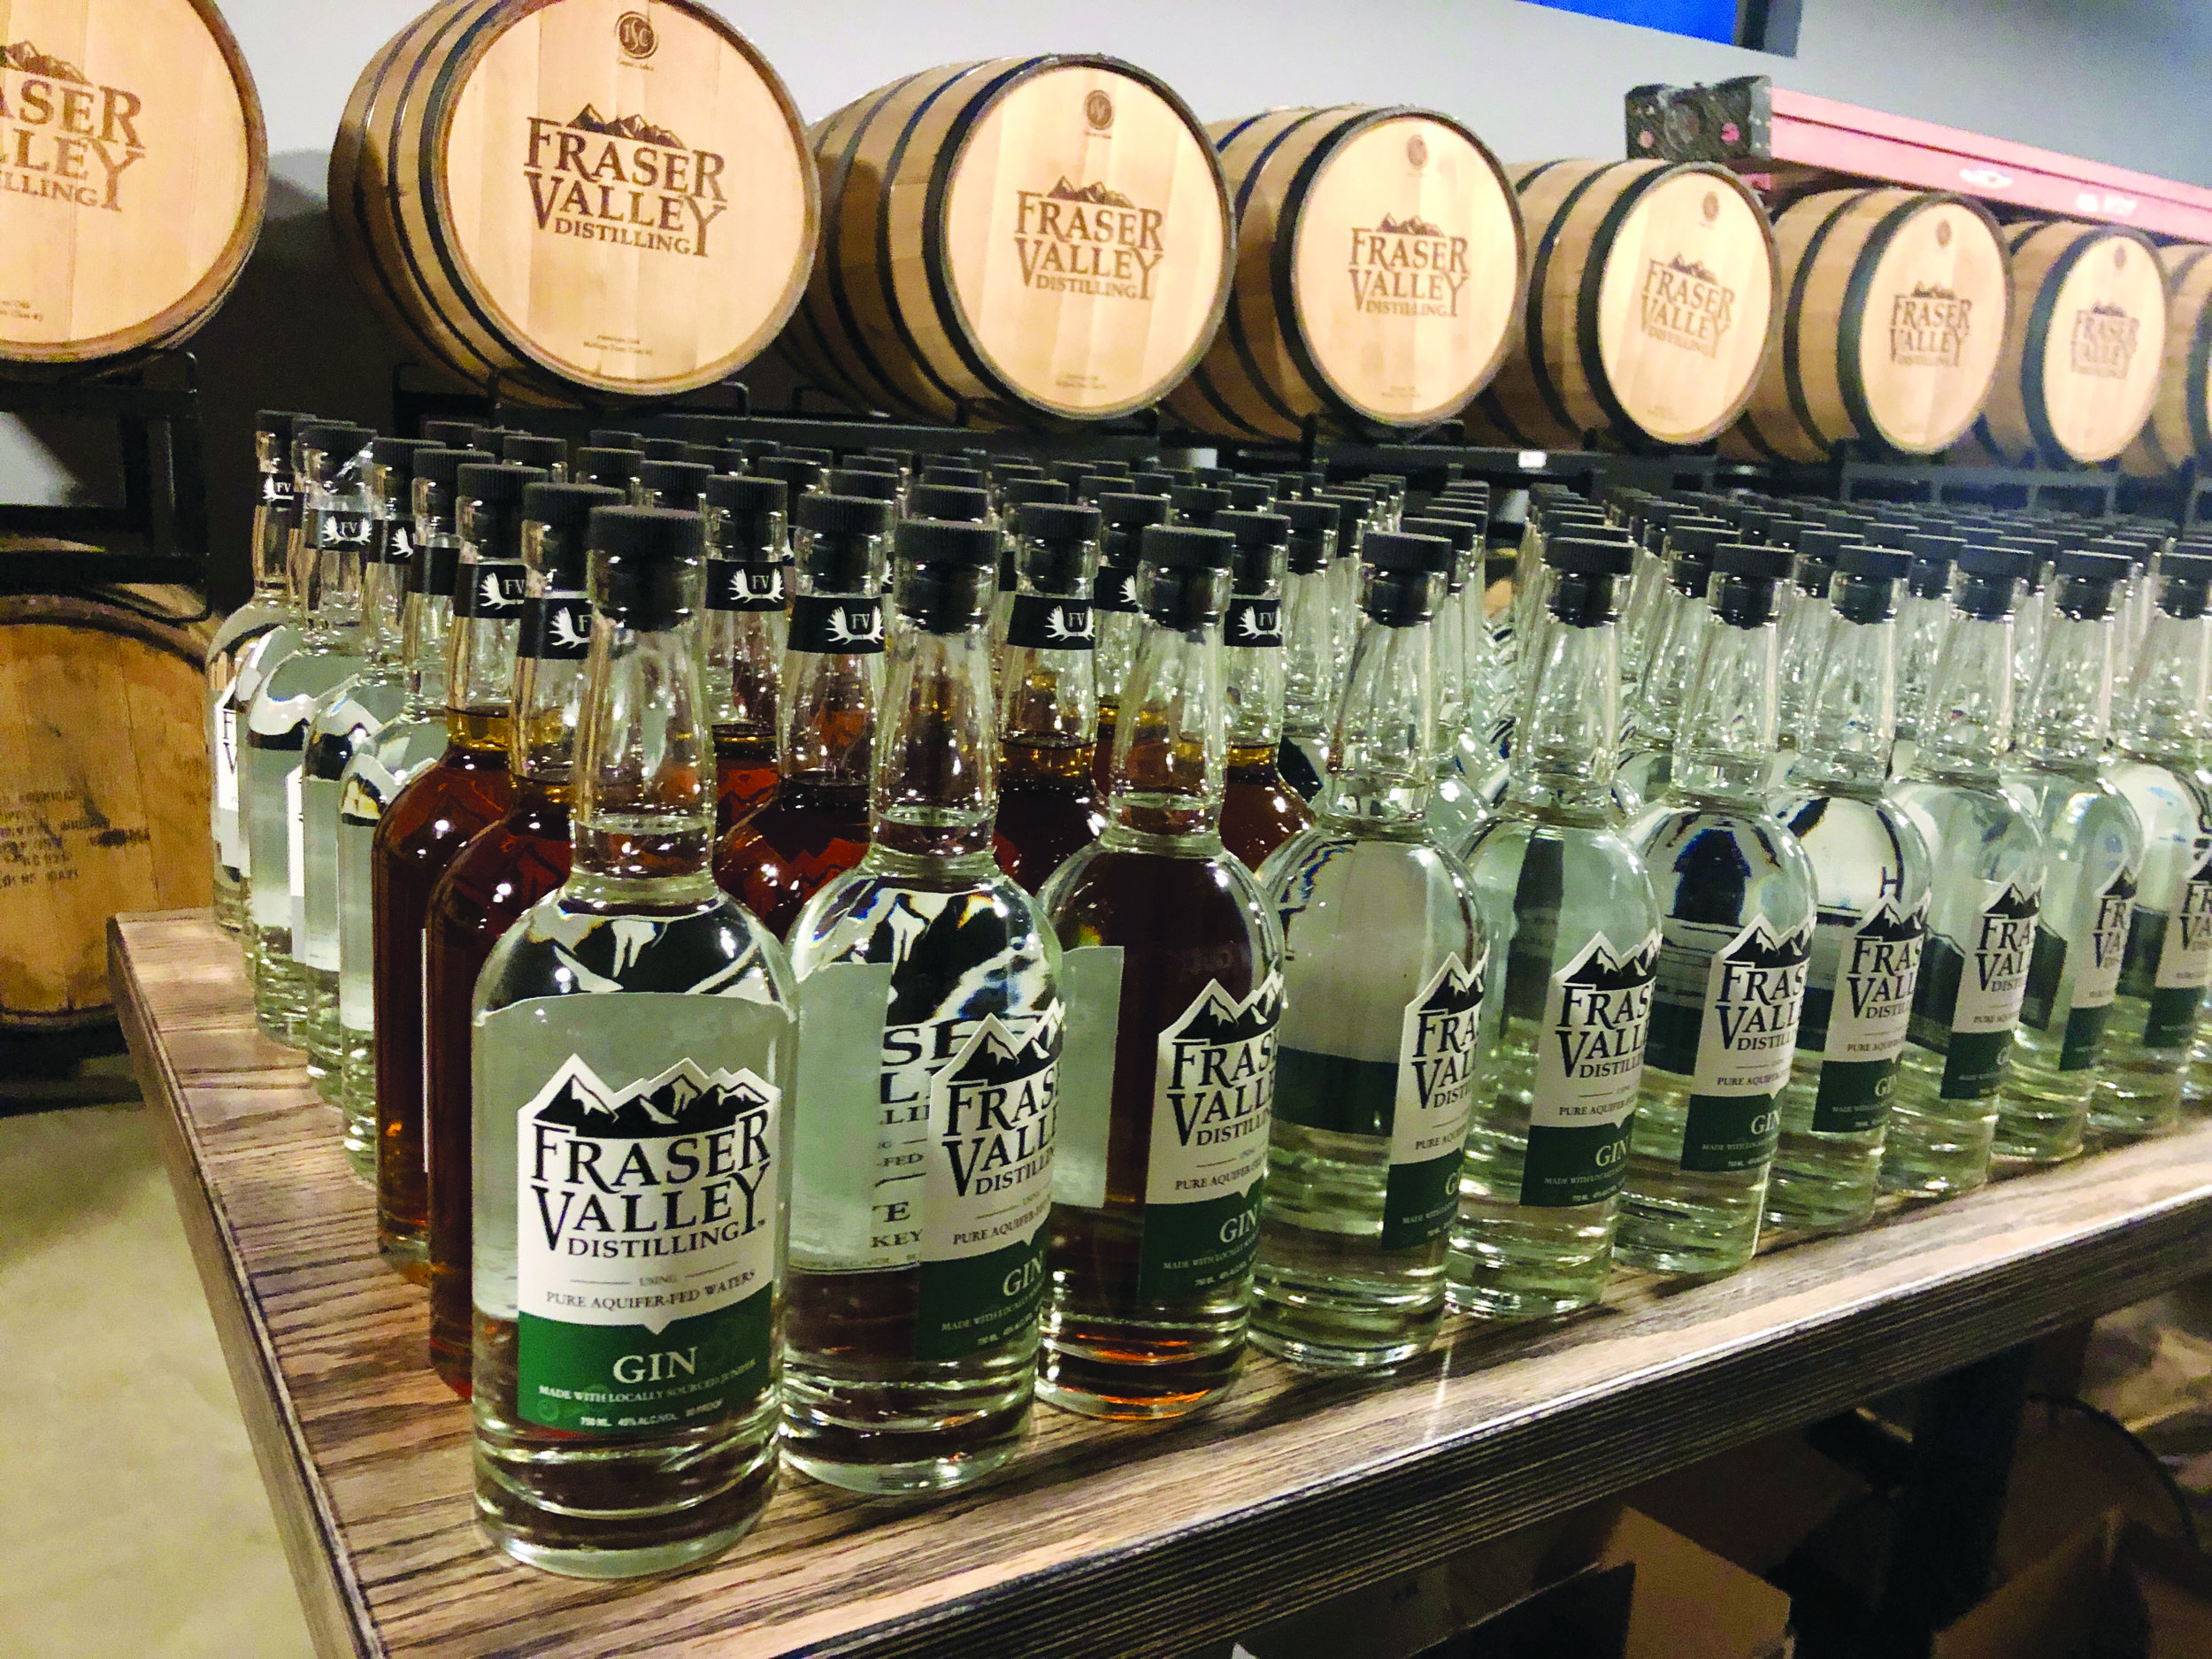 Photo: courtesy Fraser Valler Distilling